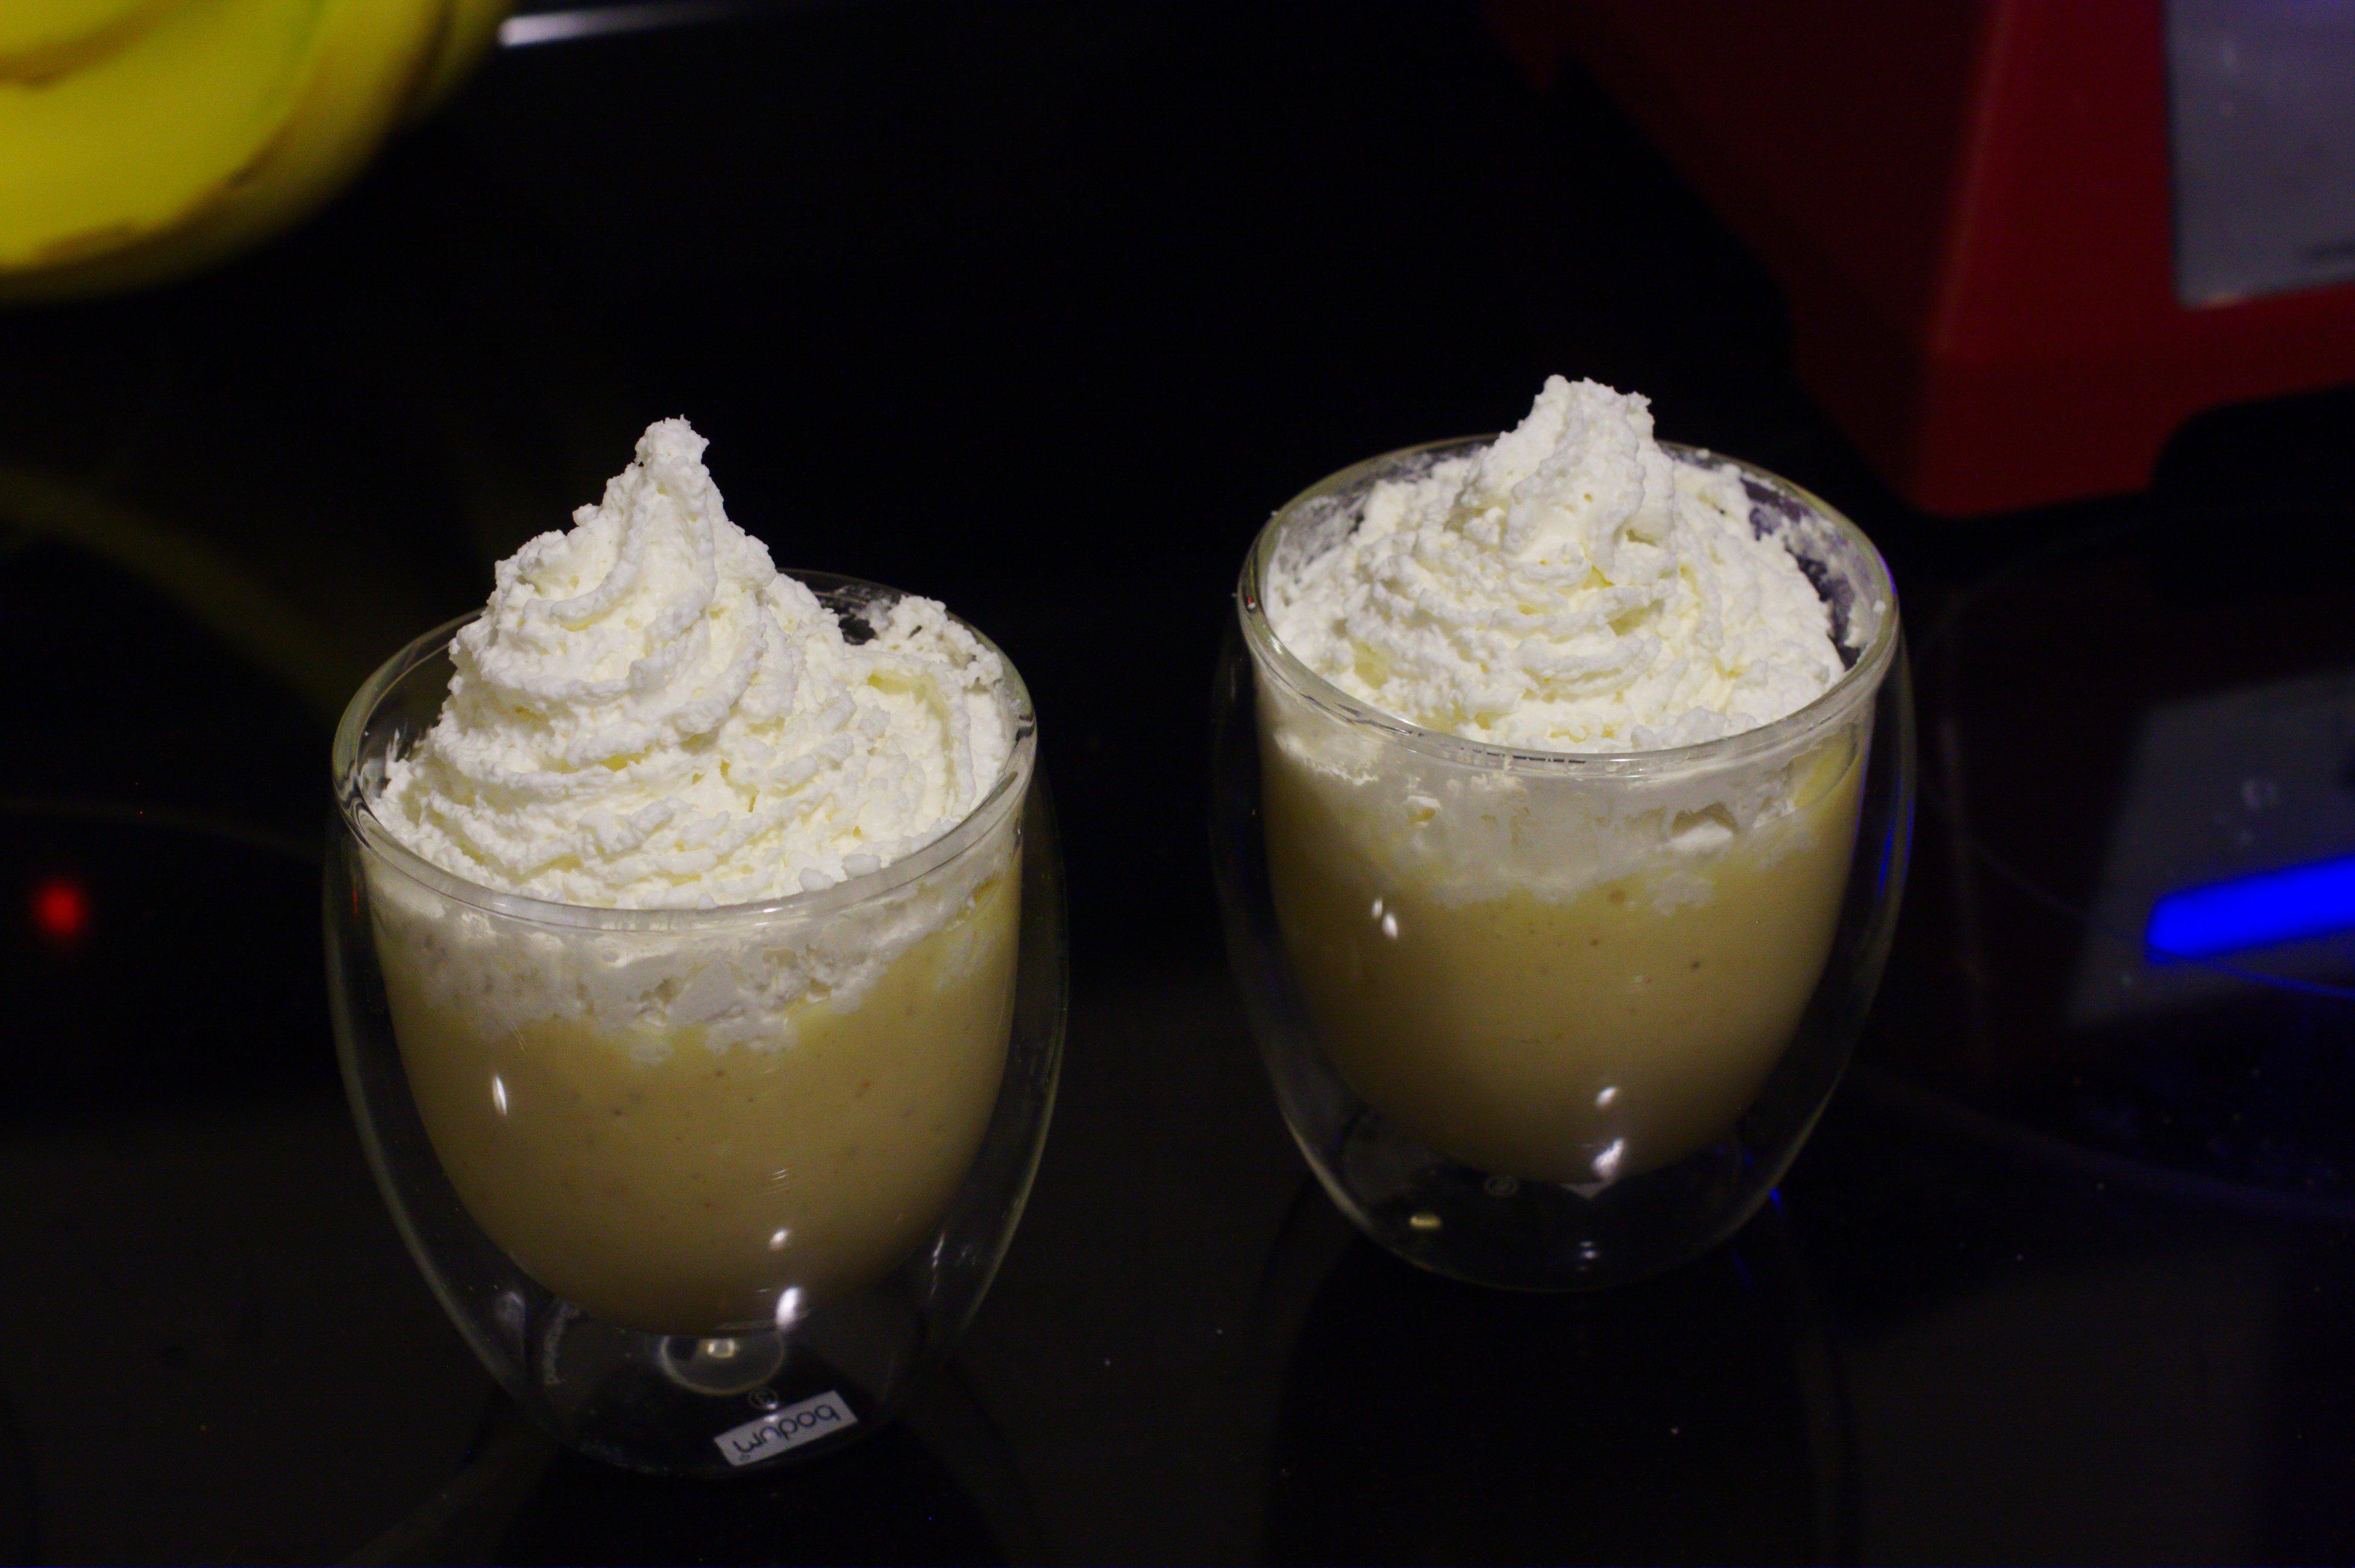 Chick-Fil-A Banana Pudding Milkshake: A Haiku